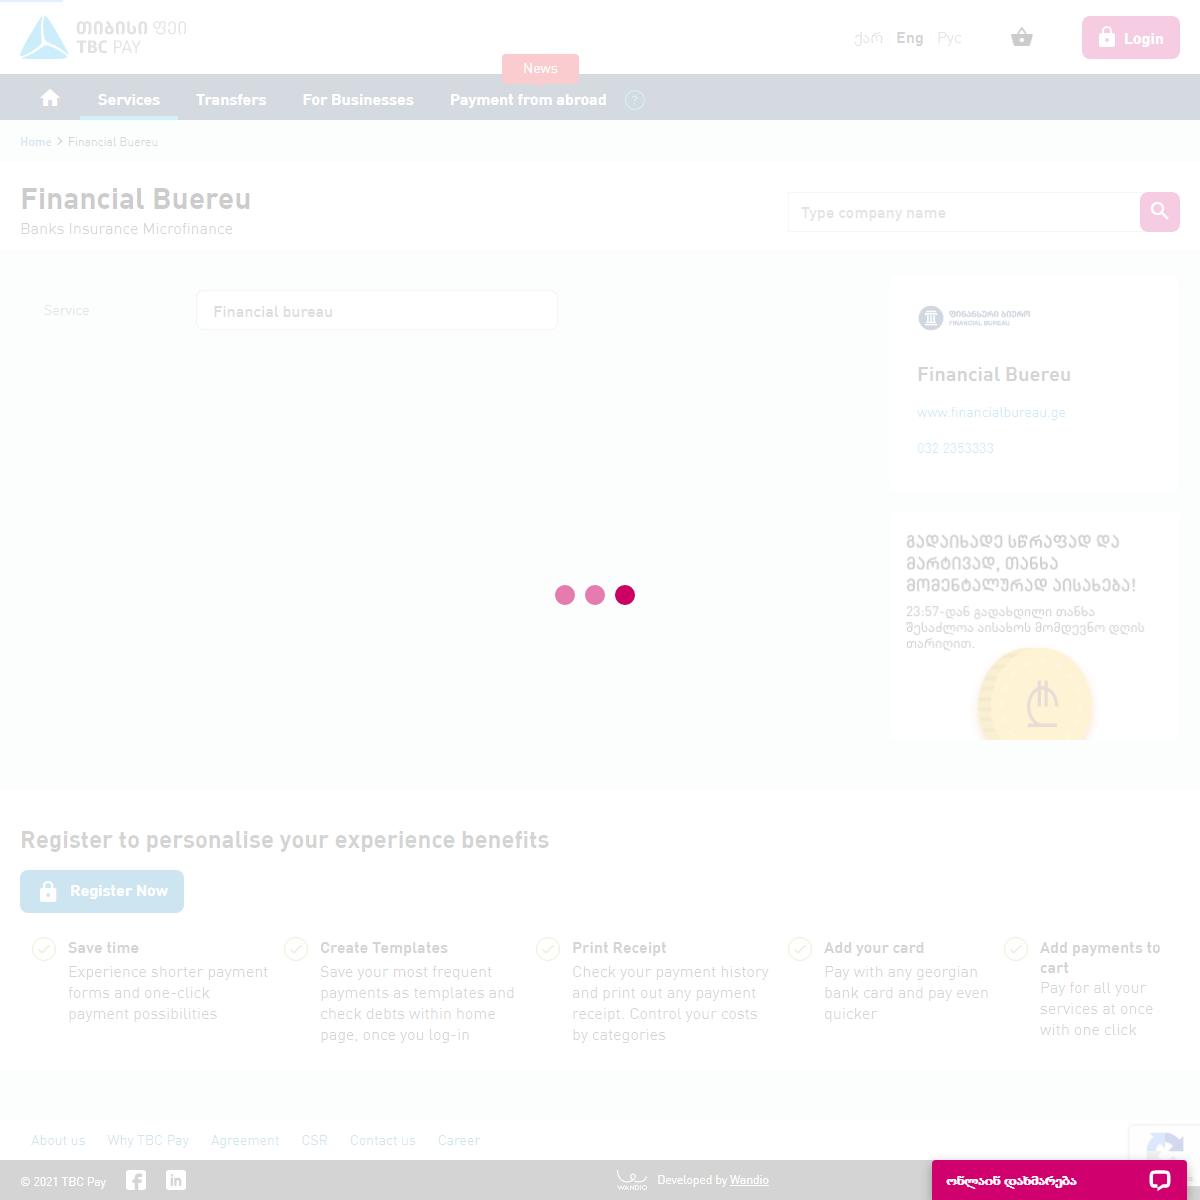 TBC Pay- finansuri biuro Pay microfinancial loan online quickly